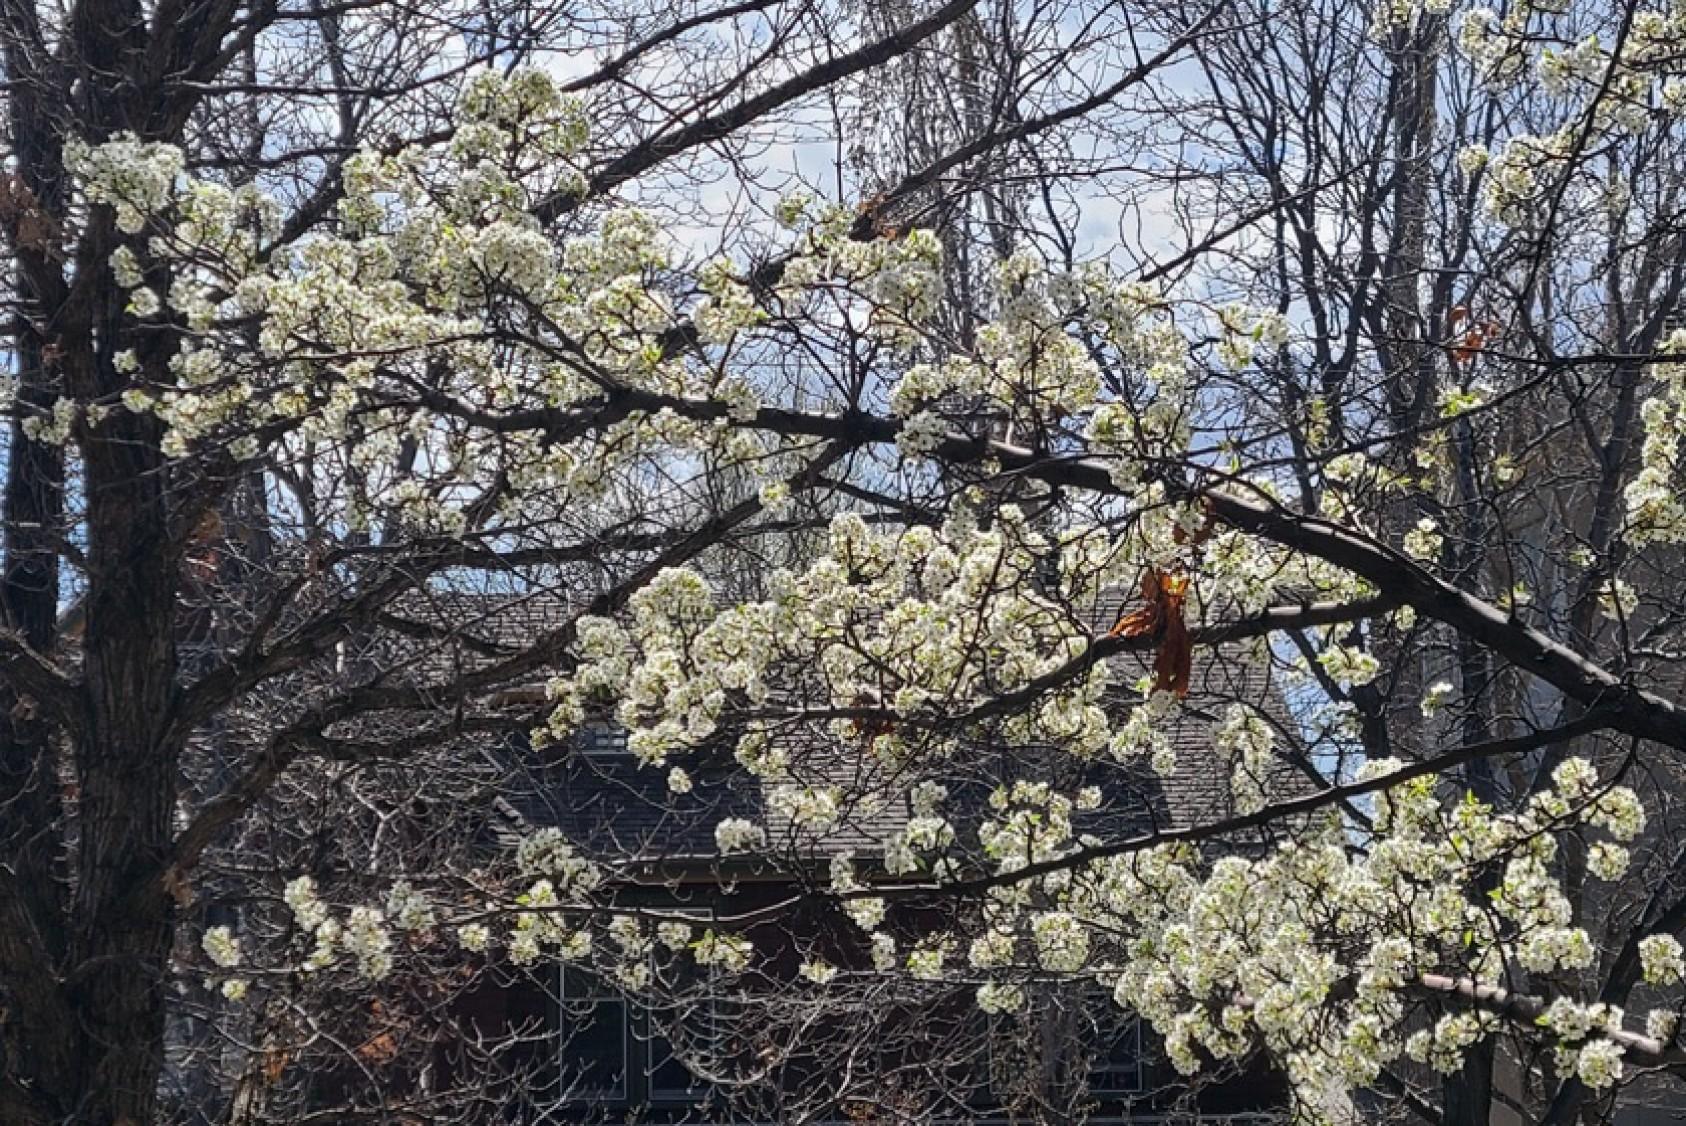 The ornamental pea tree is in bloom.